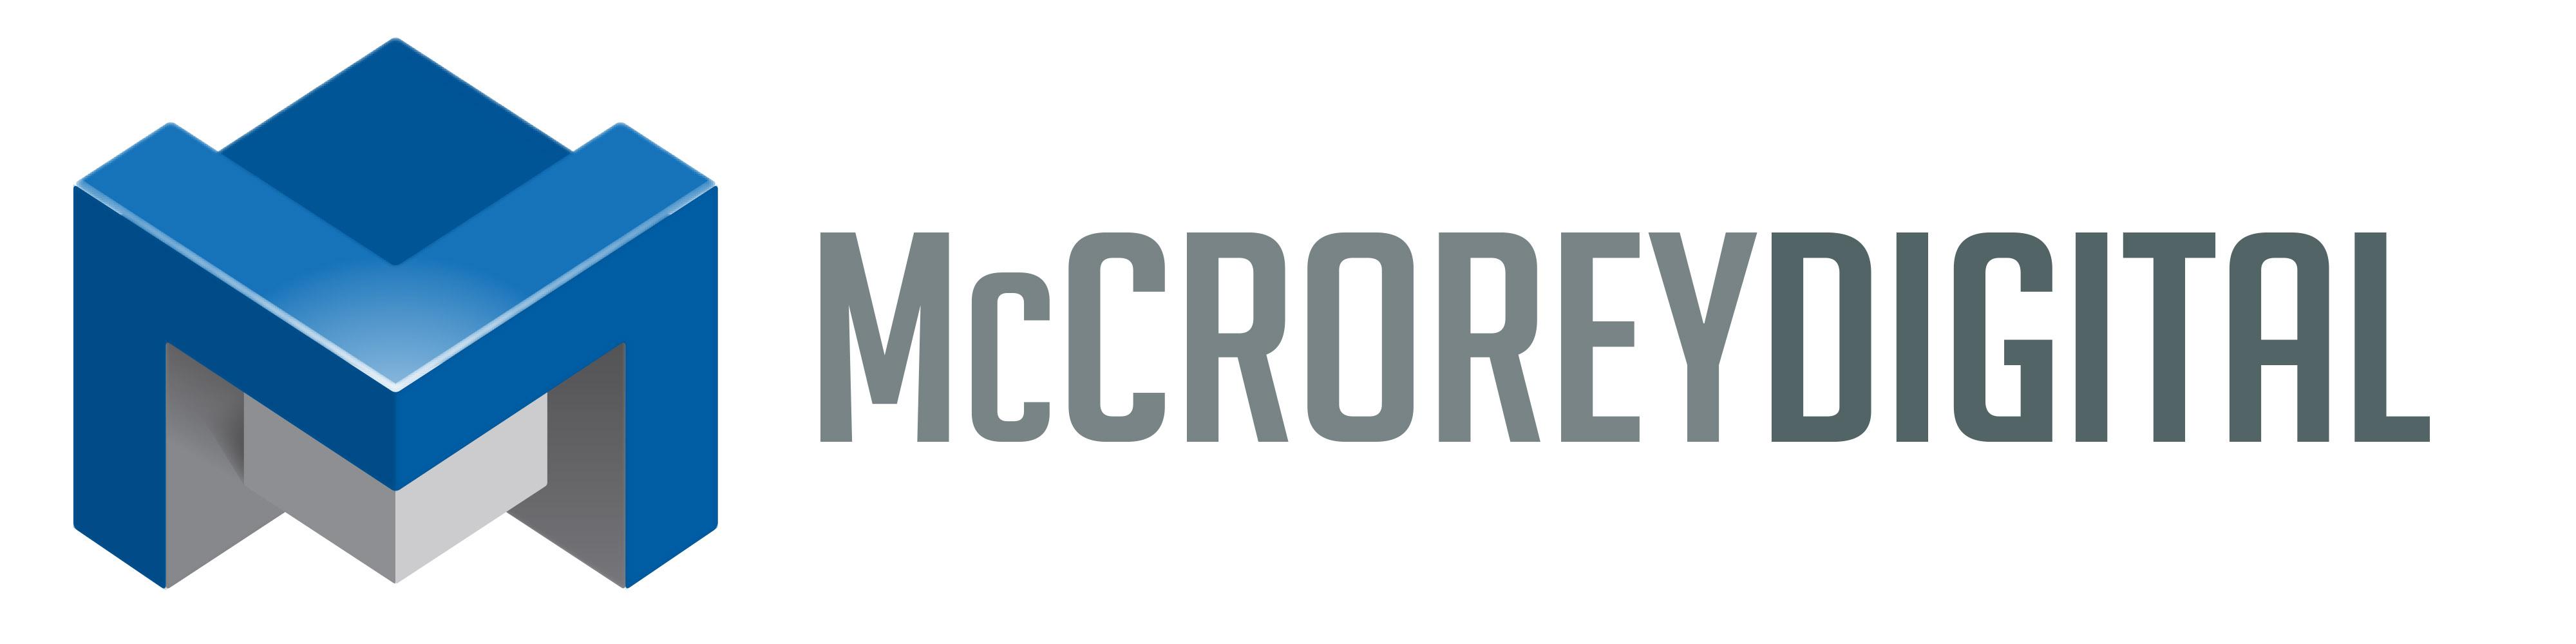 McCrorey Digital